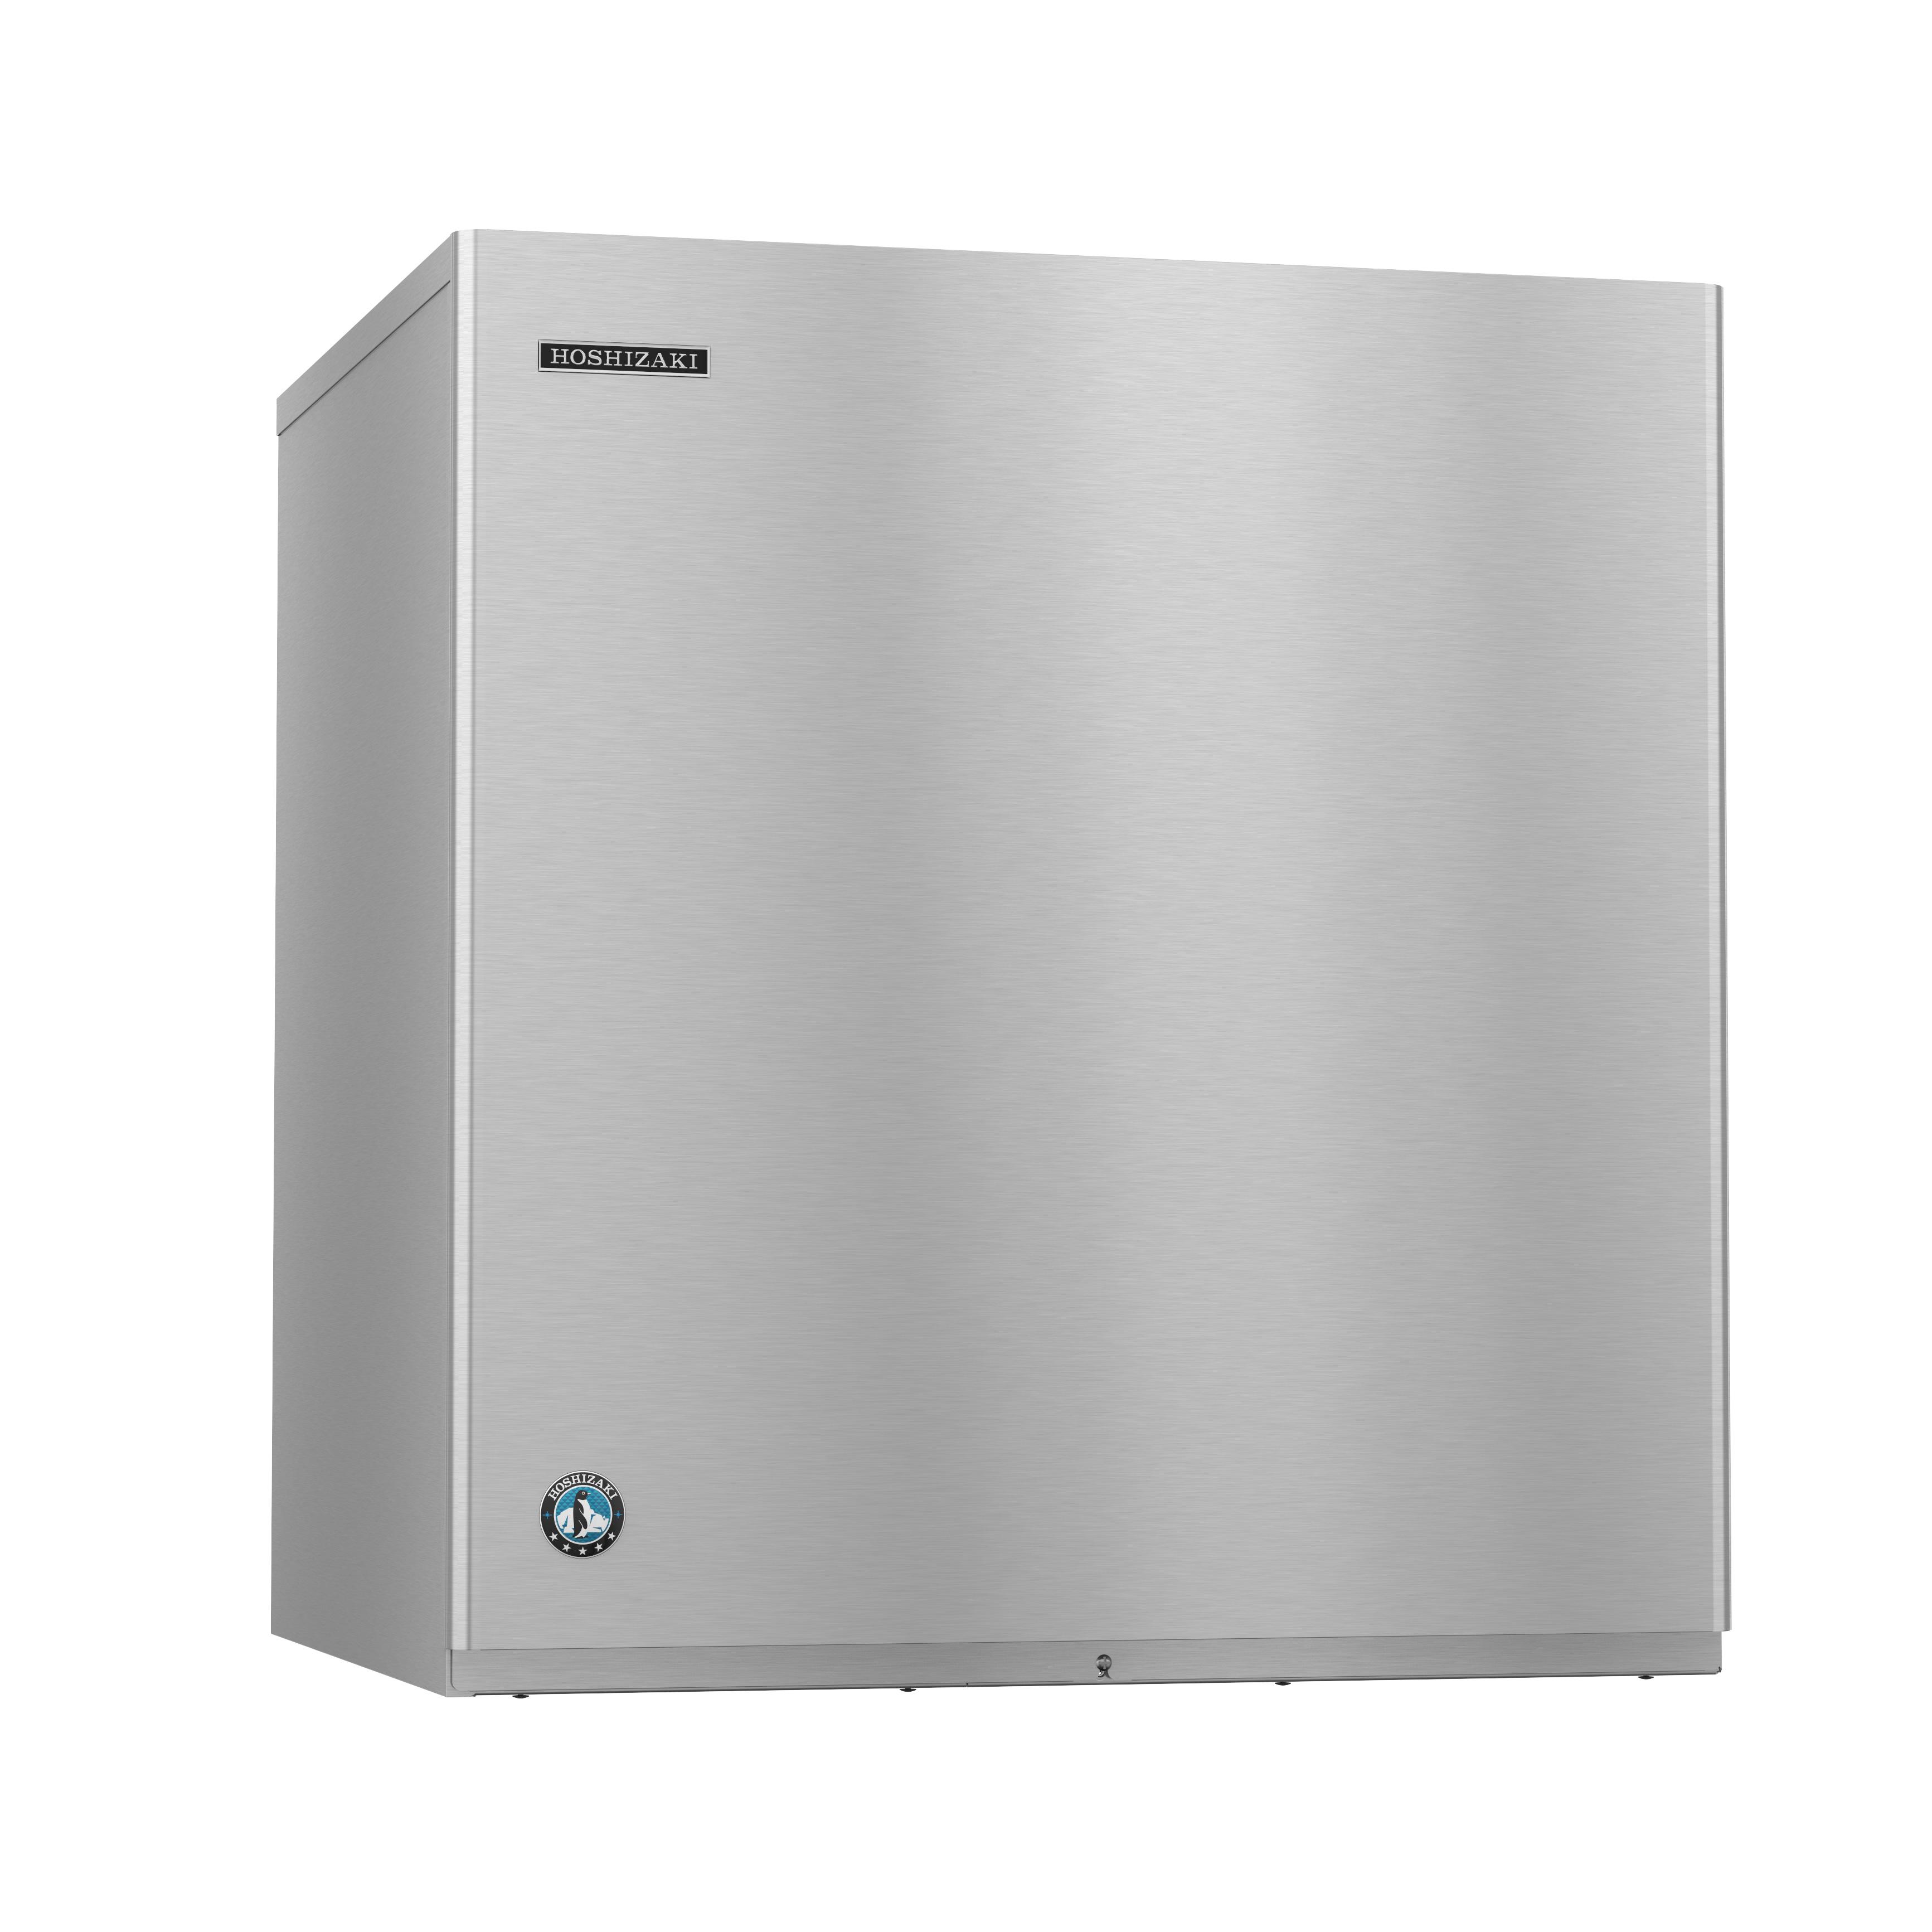 Hoshizaki KM-901MRJ3 ice cubers, ice storage & ice dispensers